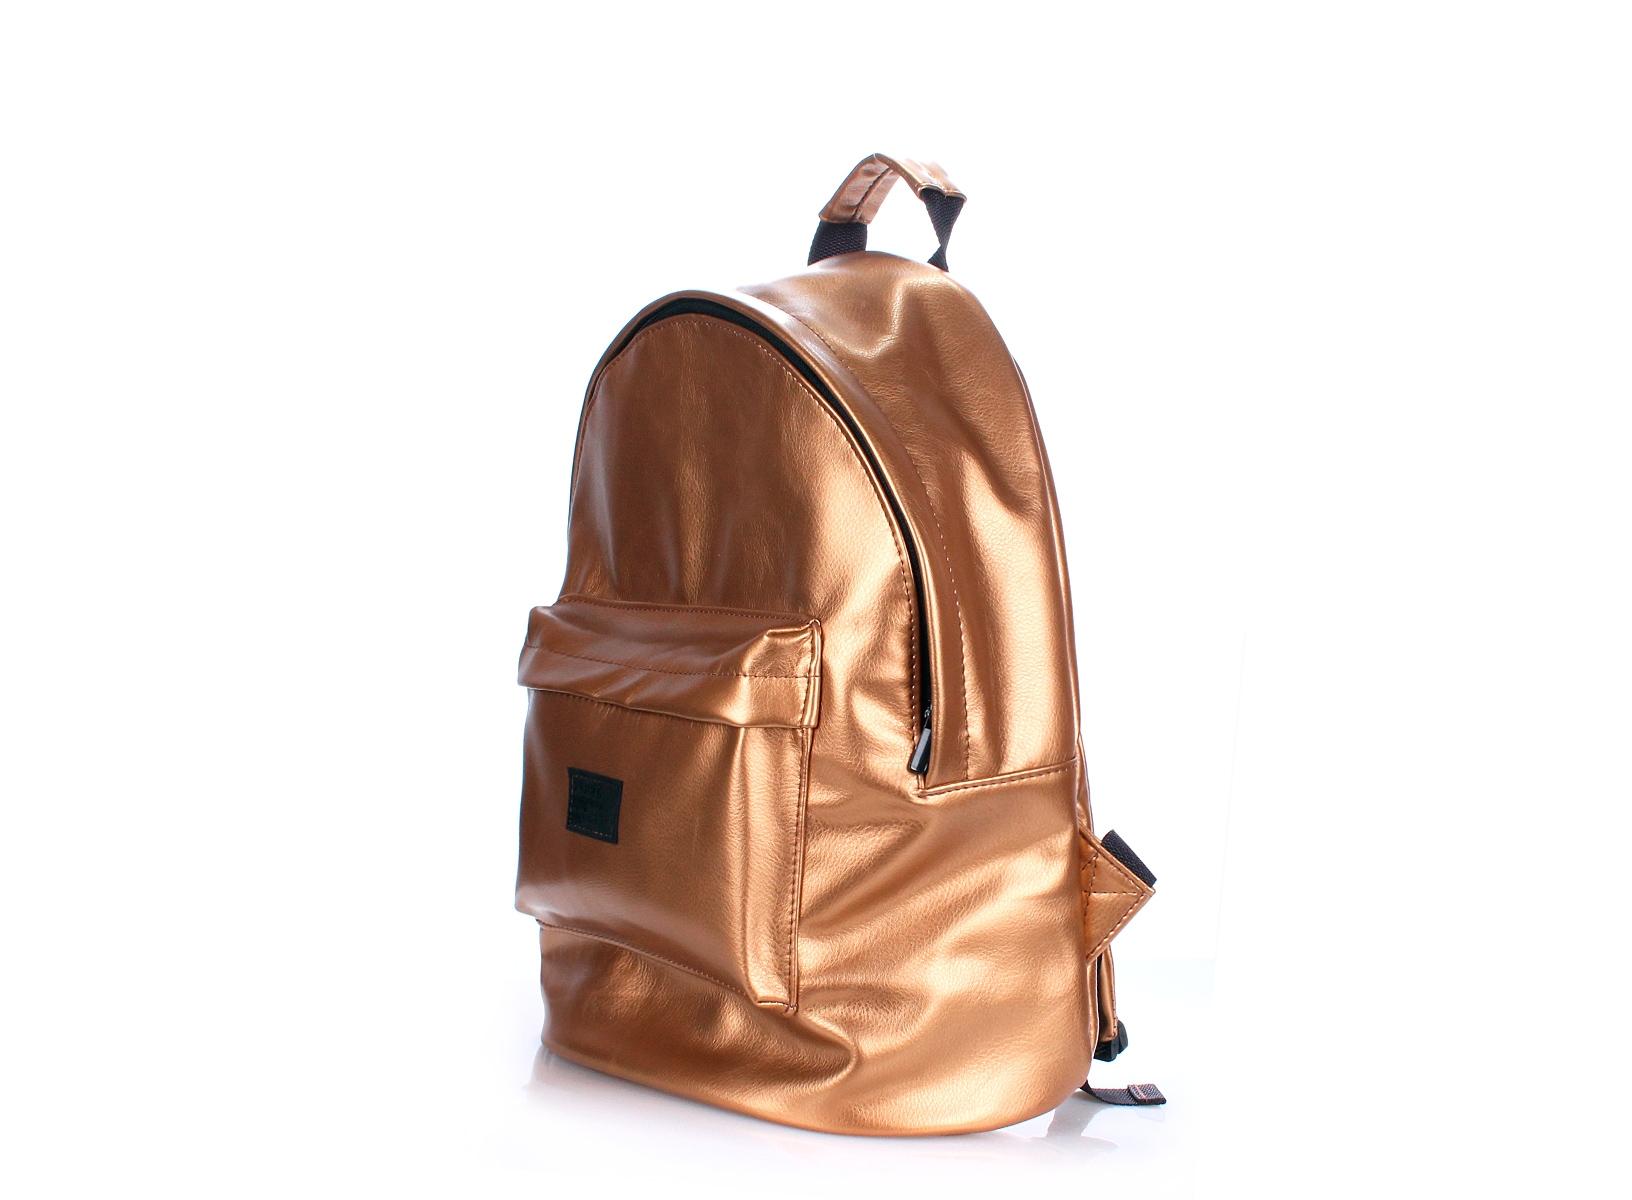 Рюкзак zoloto отзывы авторские сумки-рюкзаки